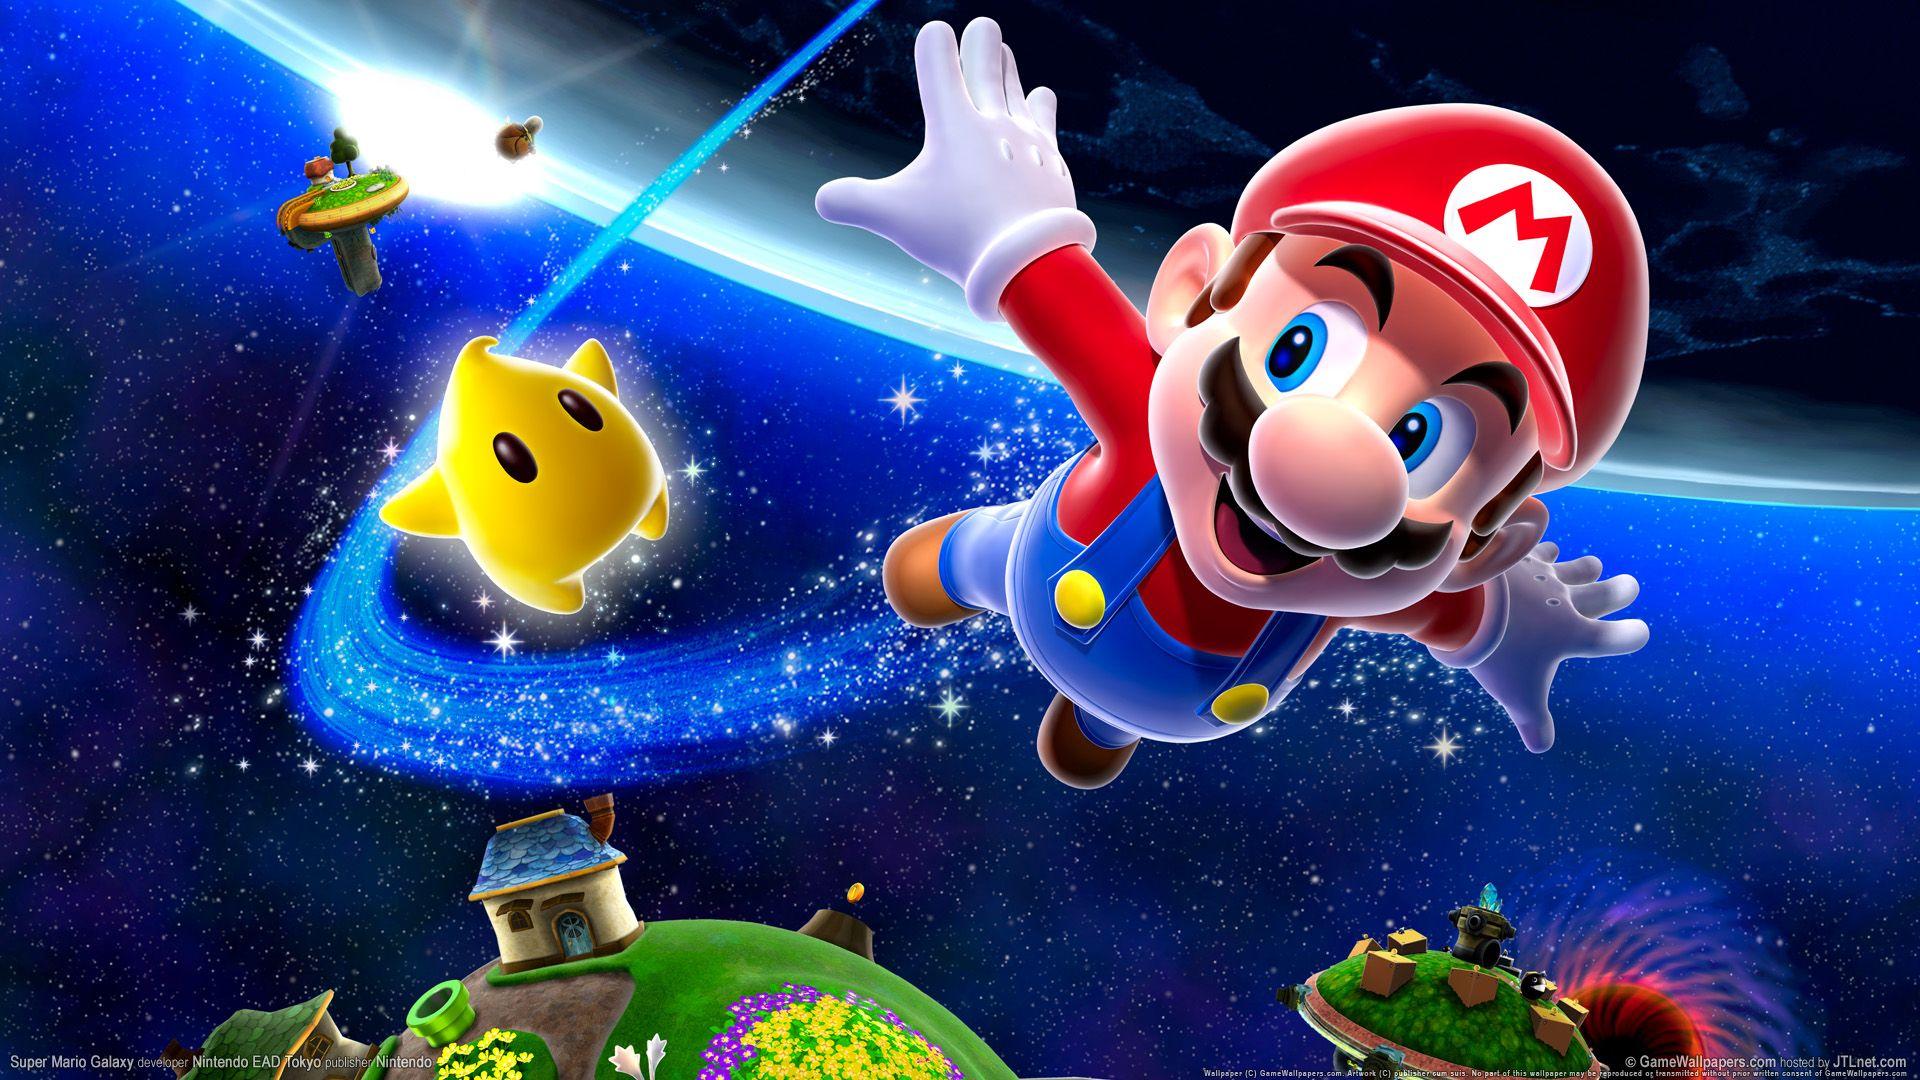 Sony Hack Reveals Plans For Mario Movie Super Mario Super Mario Galaxy Mario